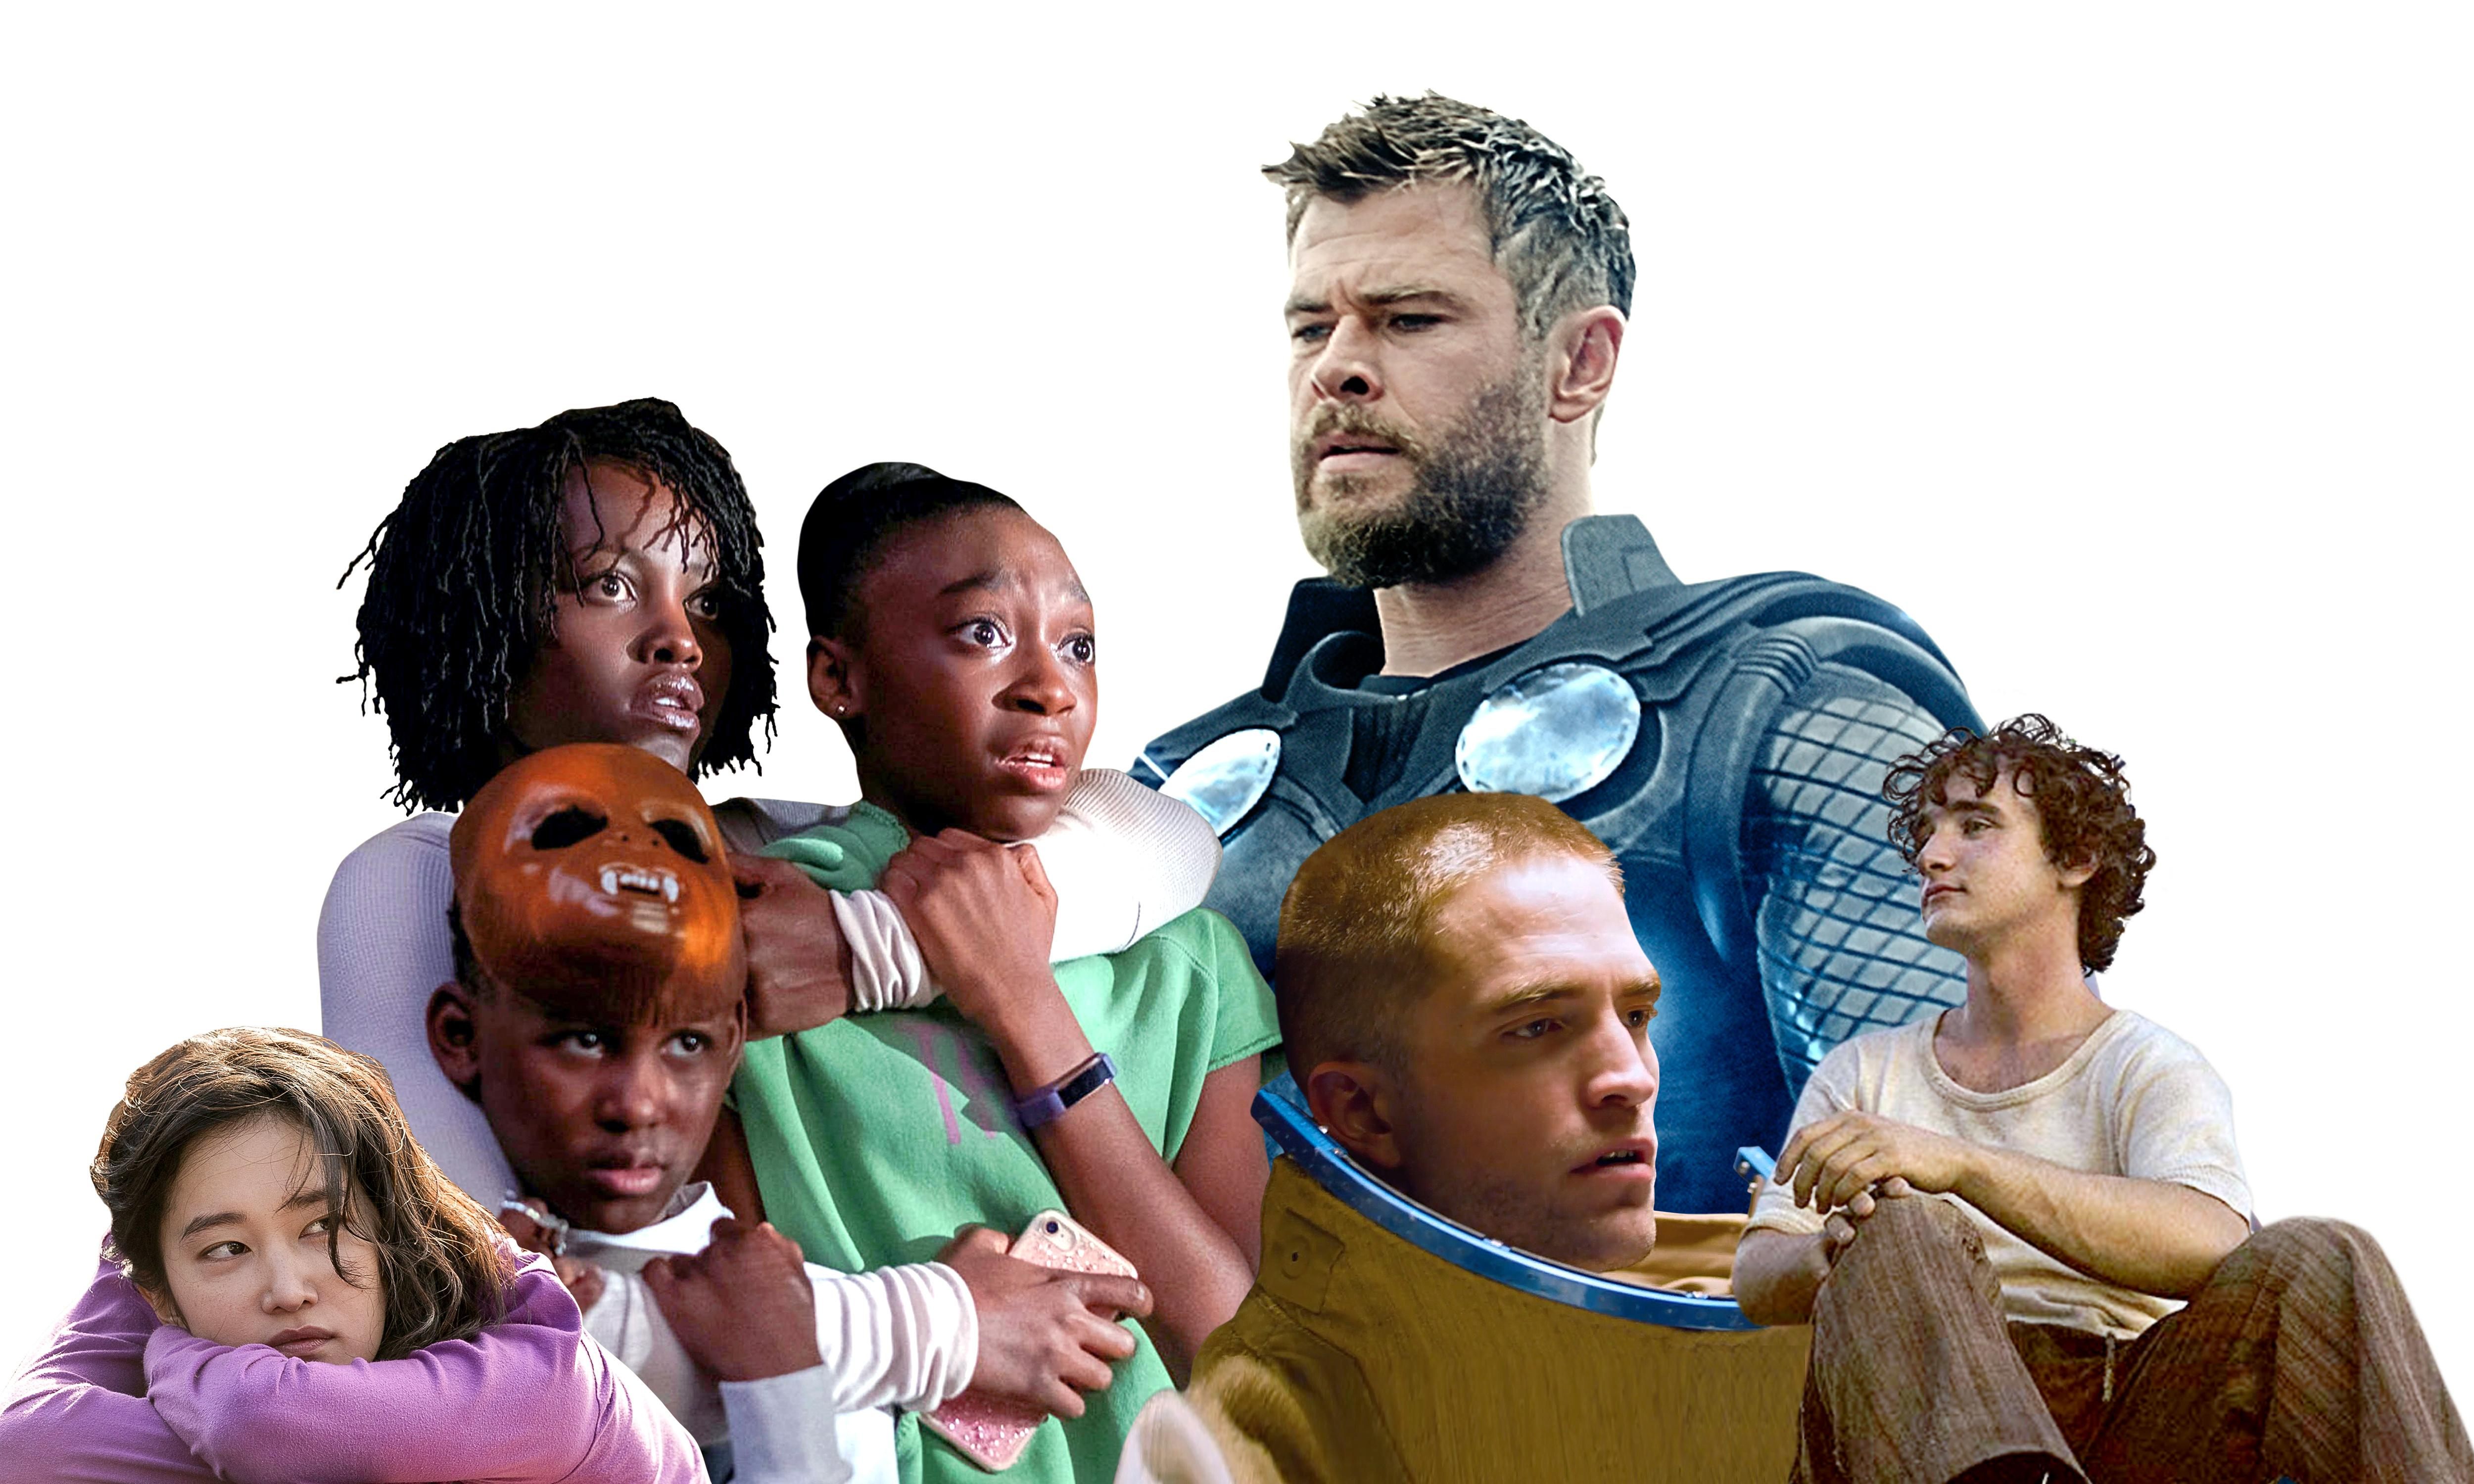 Best films of 2019 so far